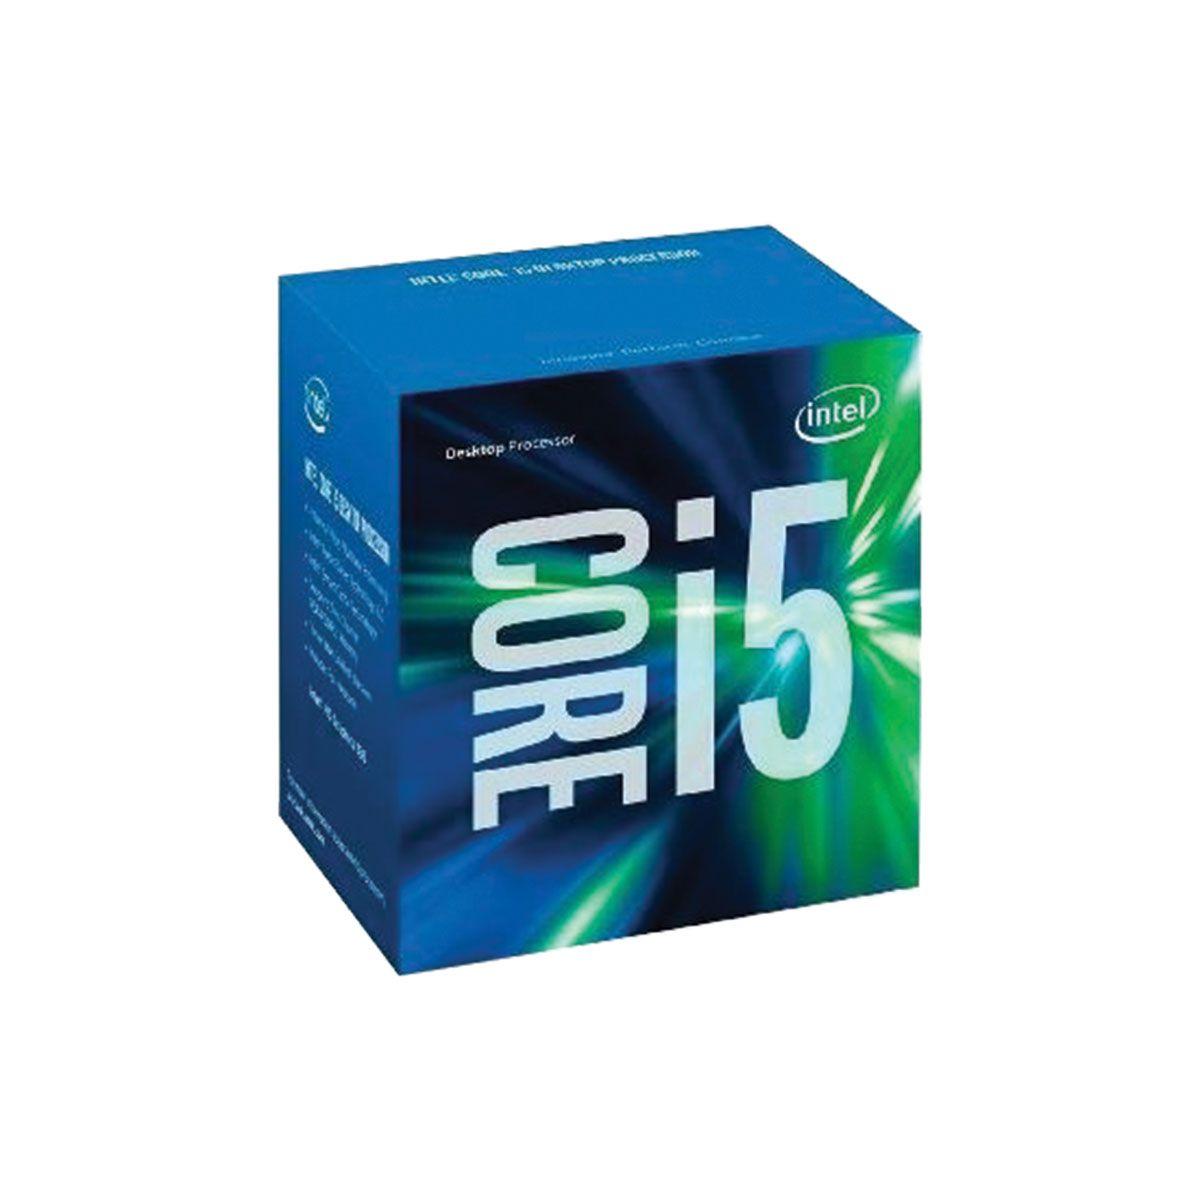 Processador Core I5-7400 BX80677I57400 3.0GHZ(MAX Turbo 3.50GHZ) 6MB Cache LGA 1151 7A Geracao